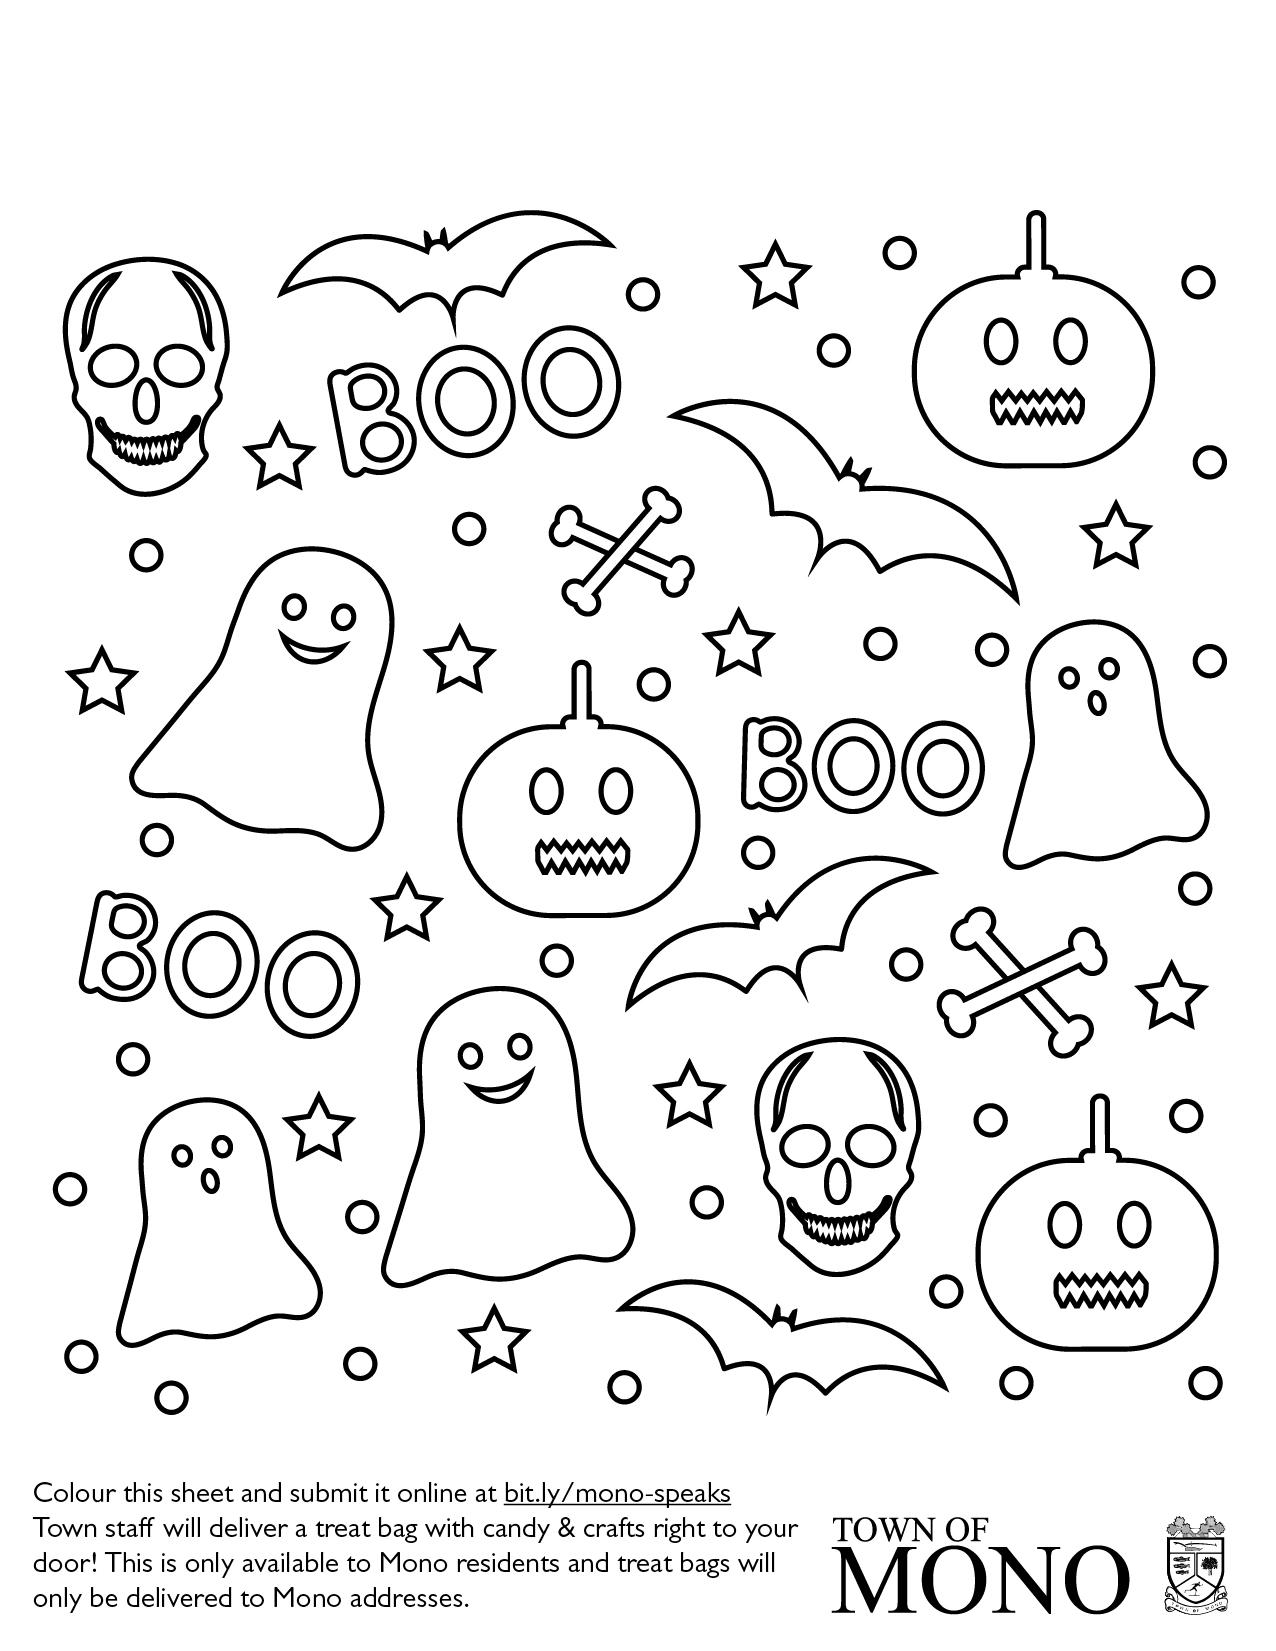 Colouring sheet: ghosts, pumpkins, skulls, etc.